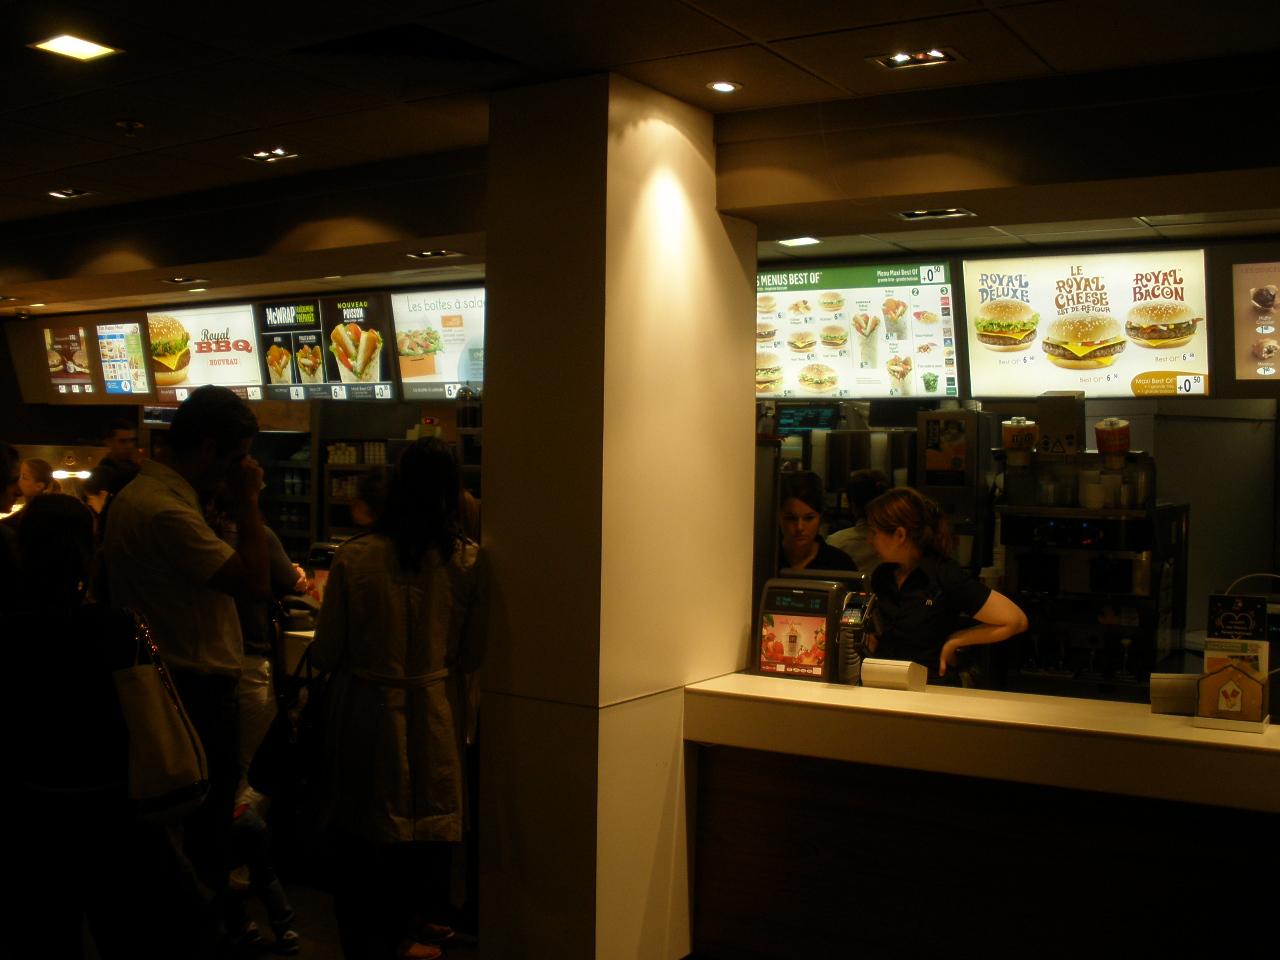 McDonalds Versailles Maneges